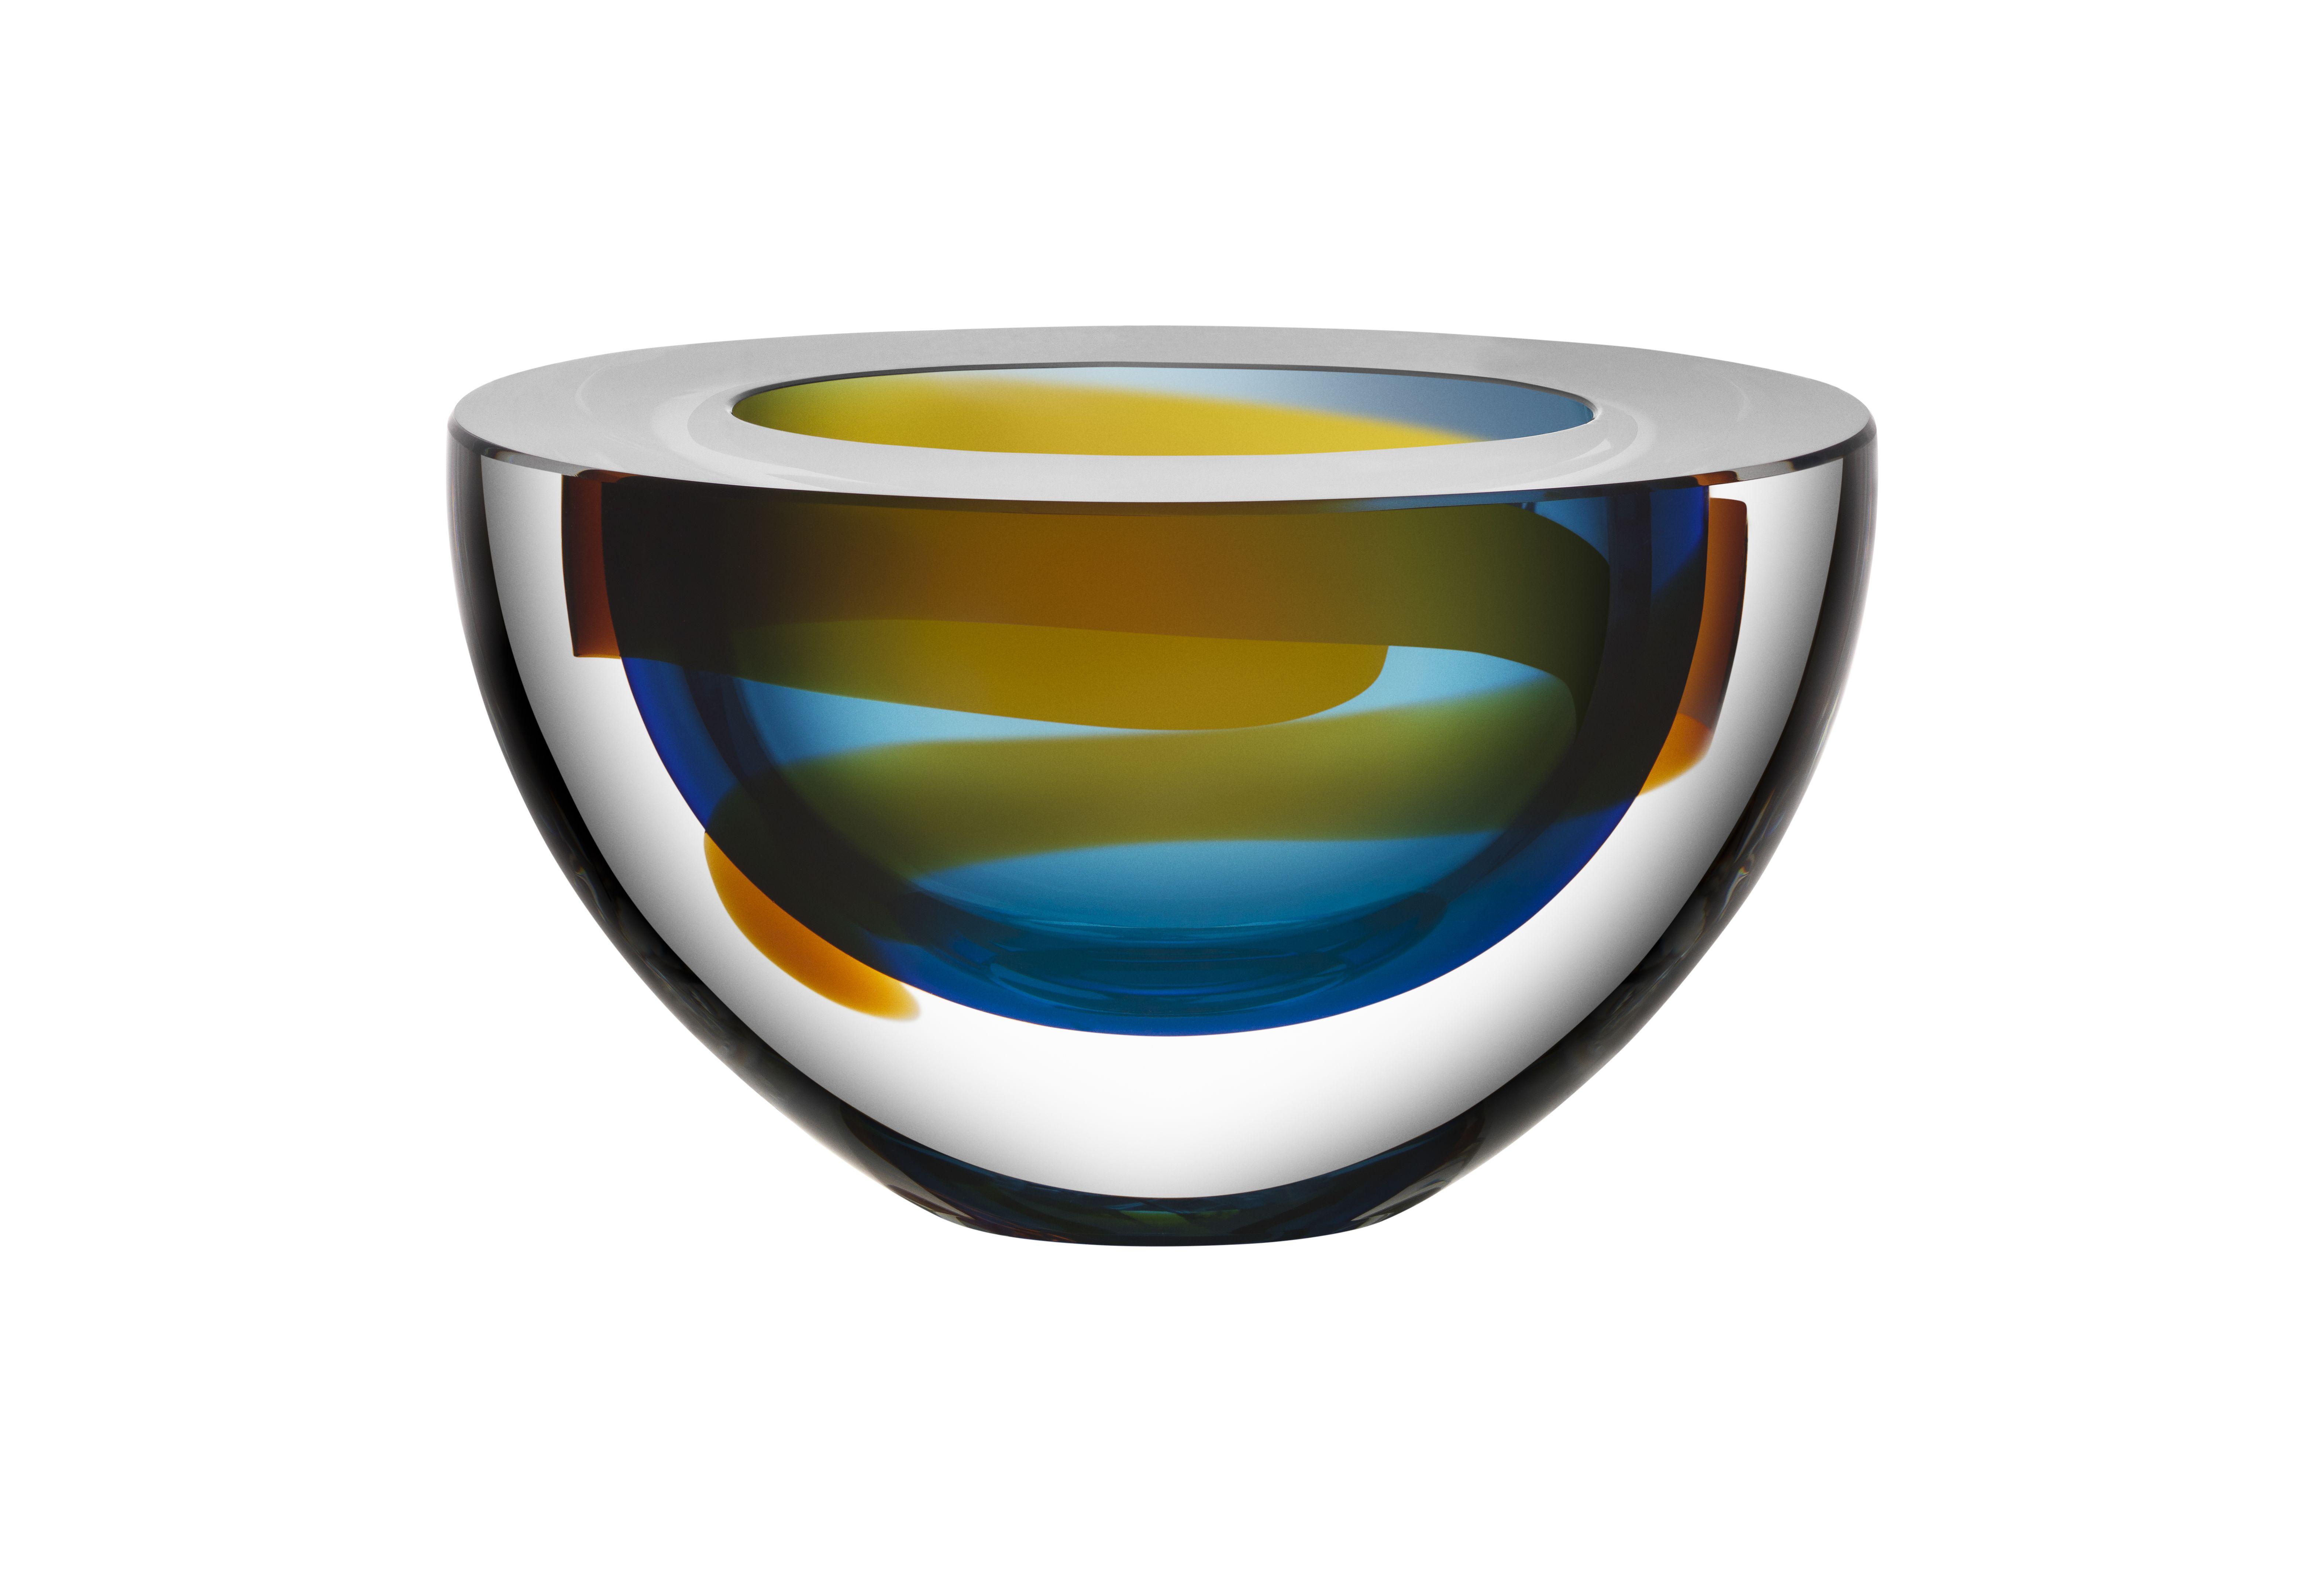 Limited art glass Oval bowl blue by Martti Rytkönen for Kosta Boda